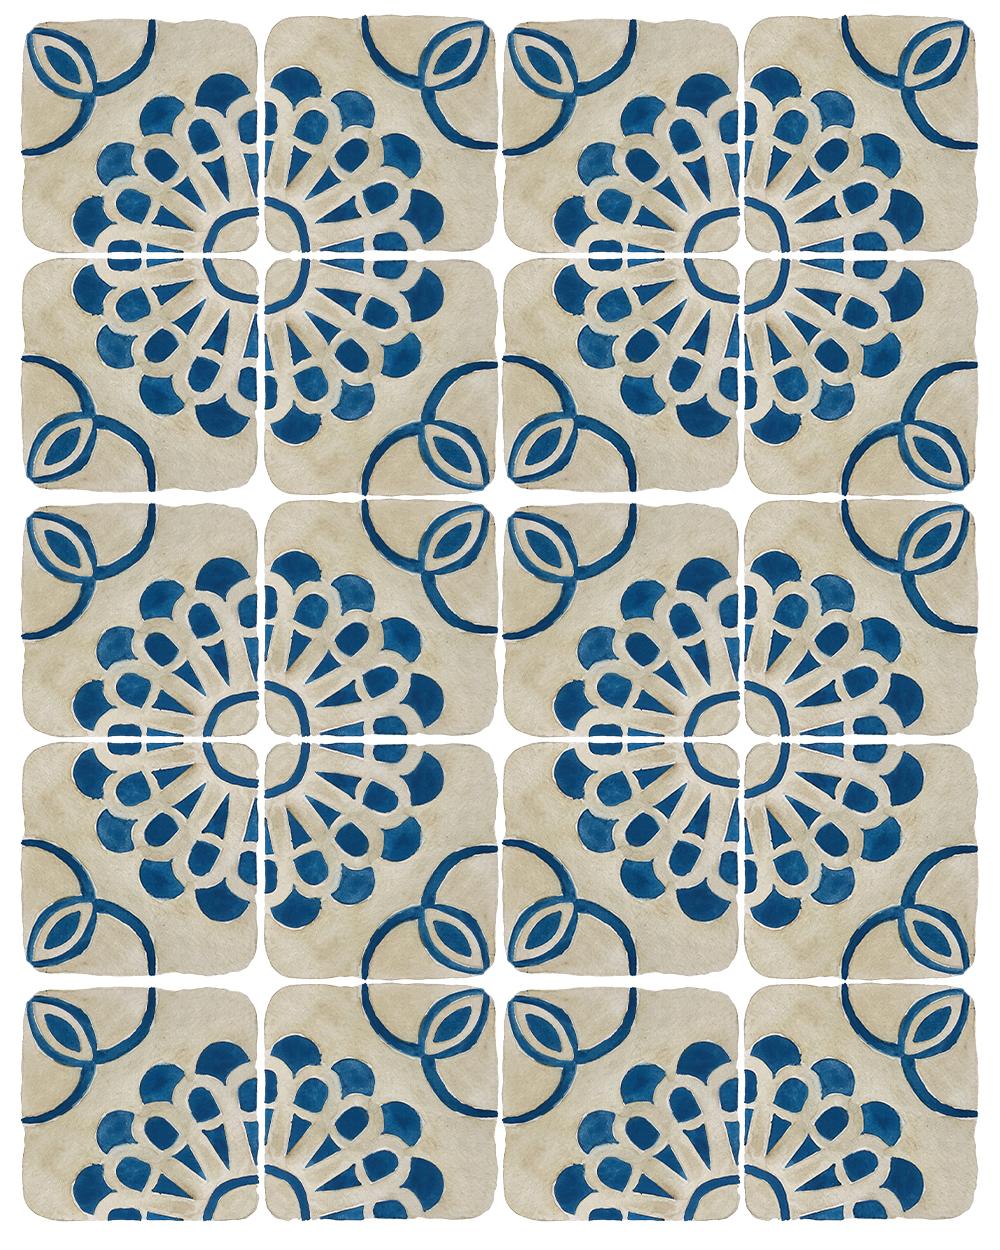 mexica-watercolor-tiles-pattern-04.jpg